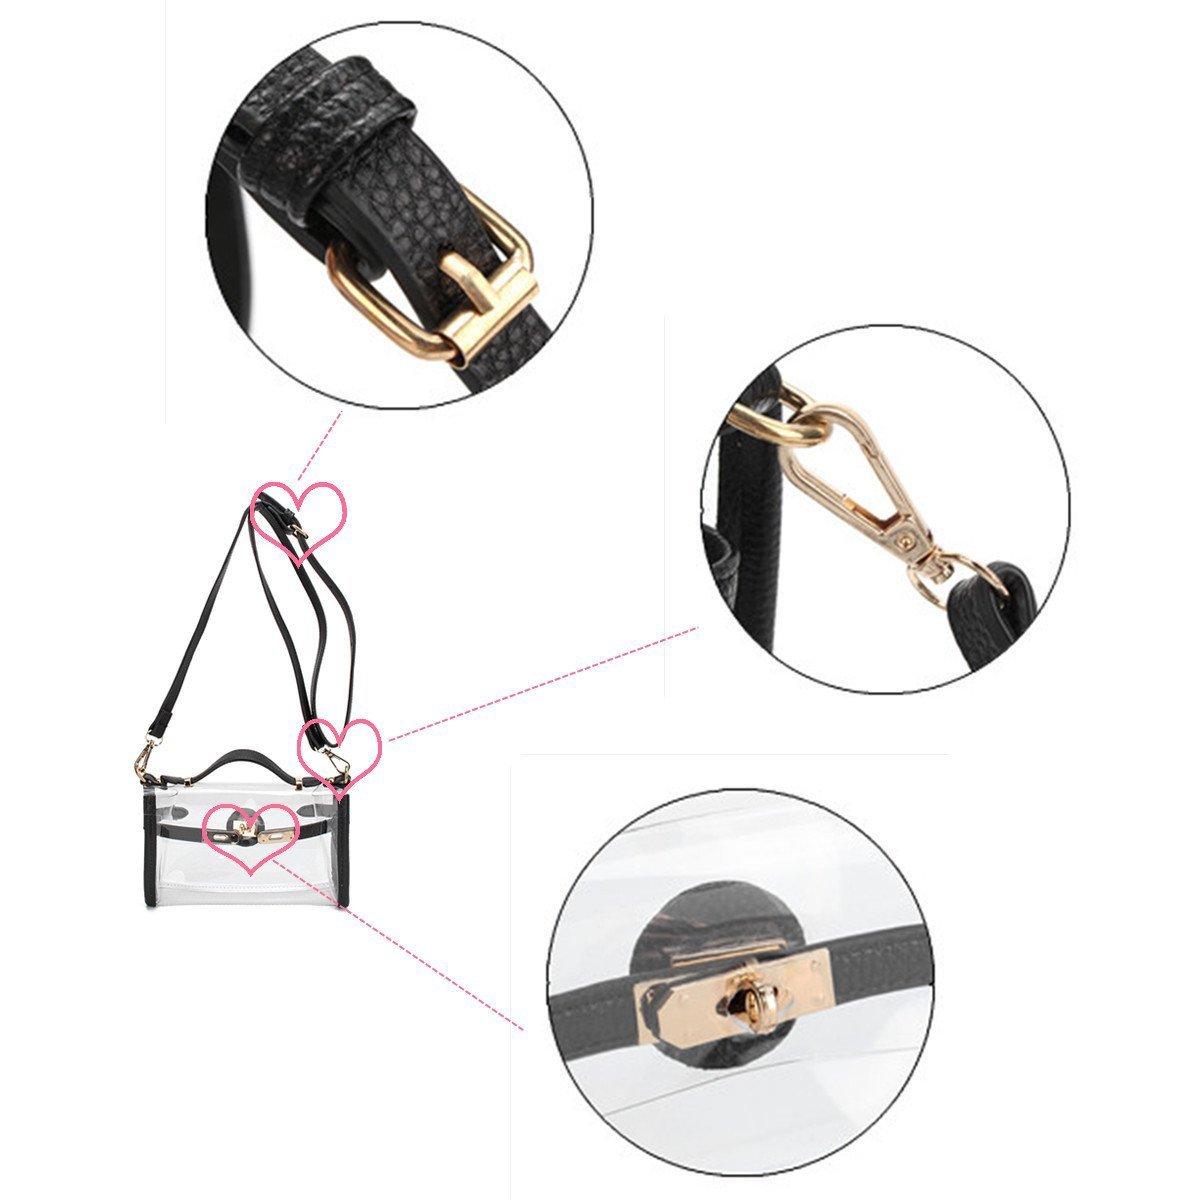 Haolong Womens Clear Jelly Bag Transparent Cross-Body Messenger Shoulder Bag Purse